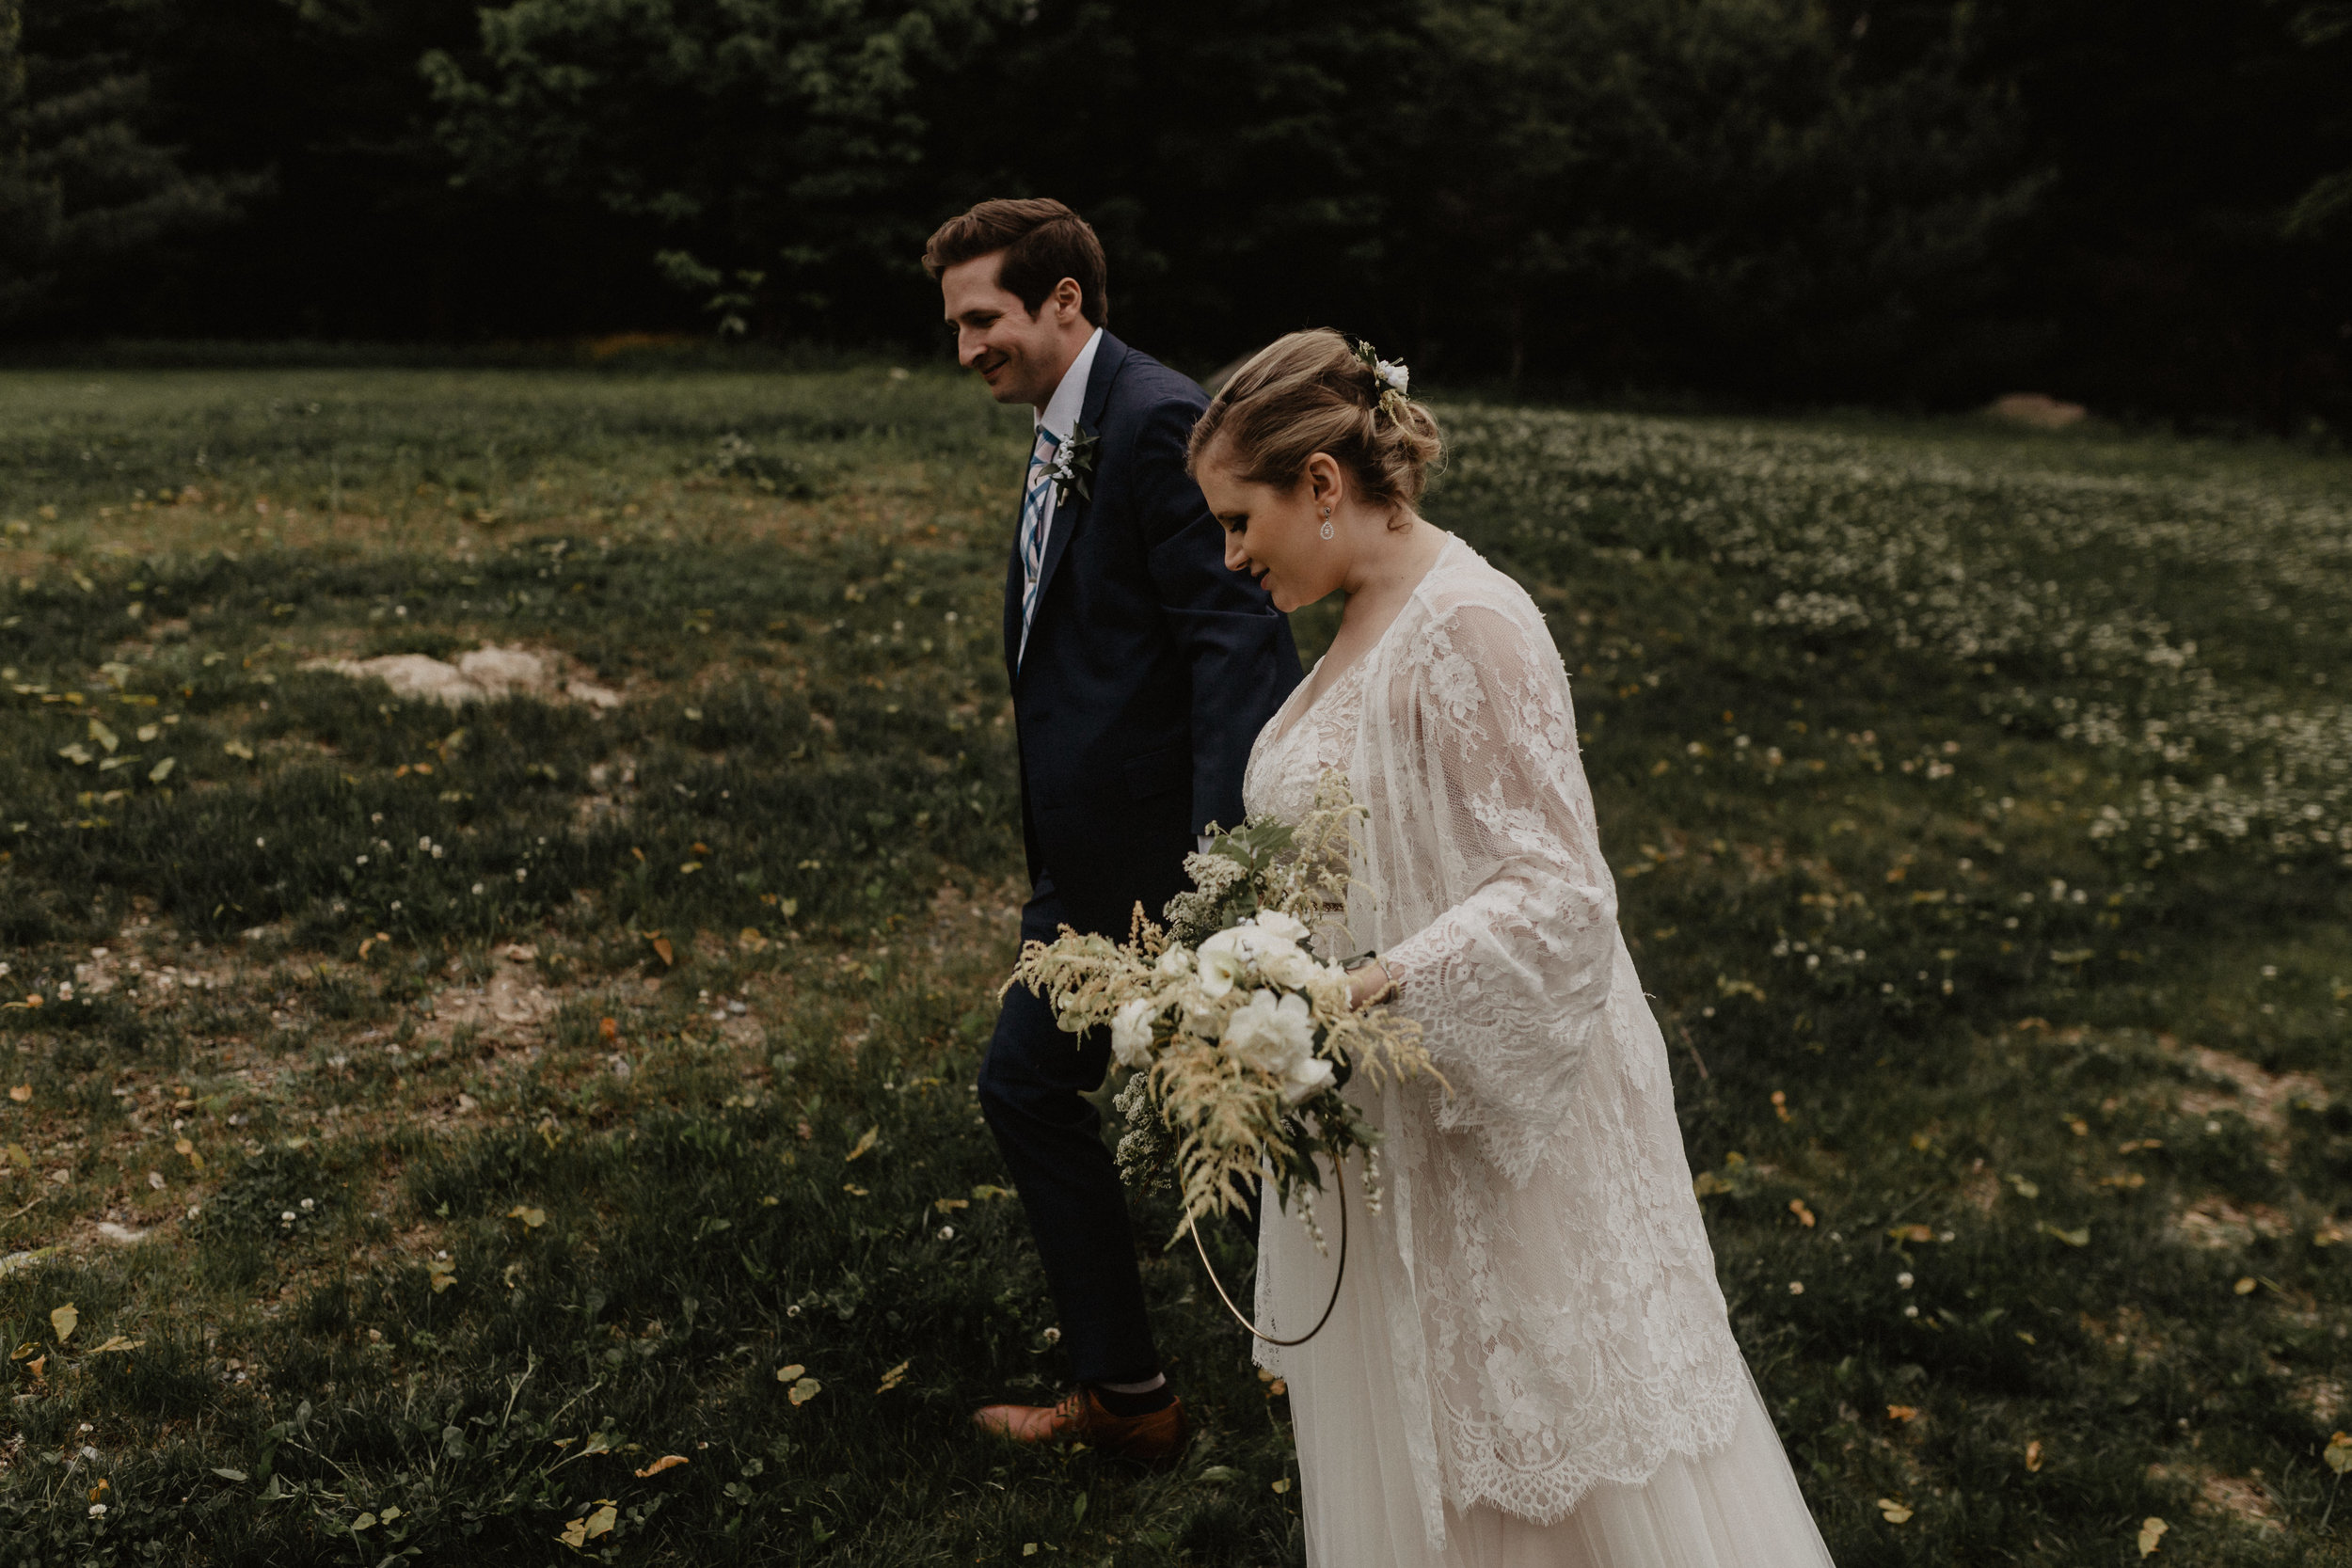 greywacke_meadows_wedding_-119.jpg